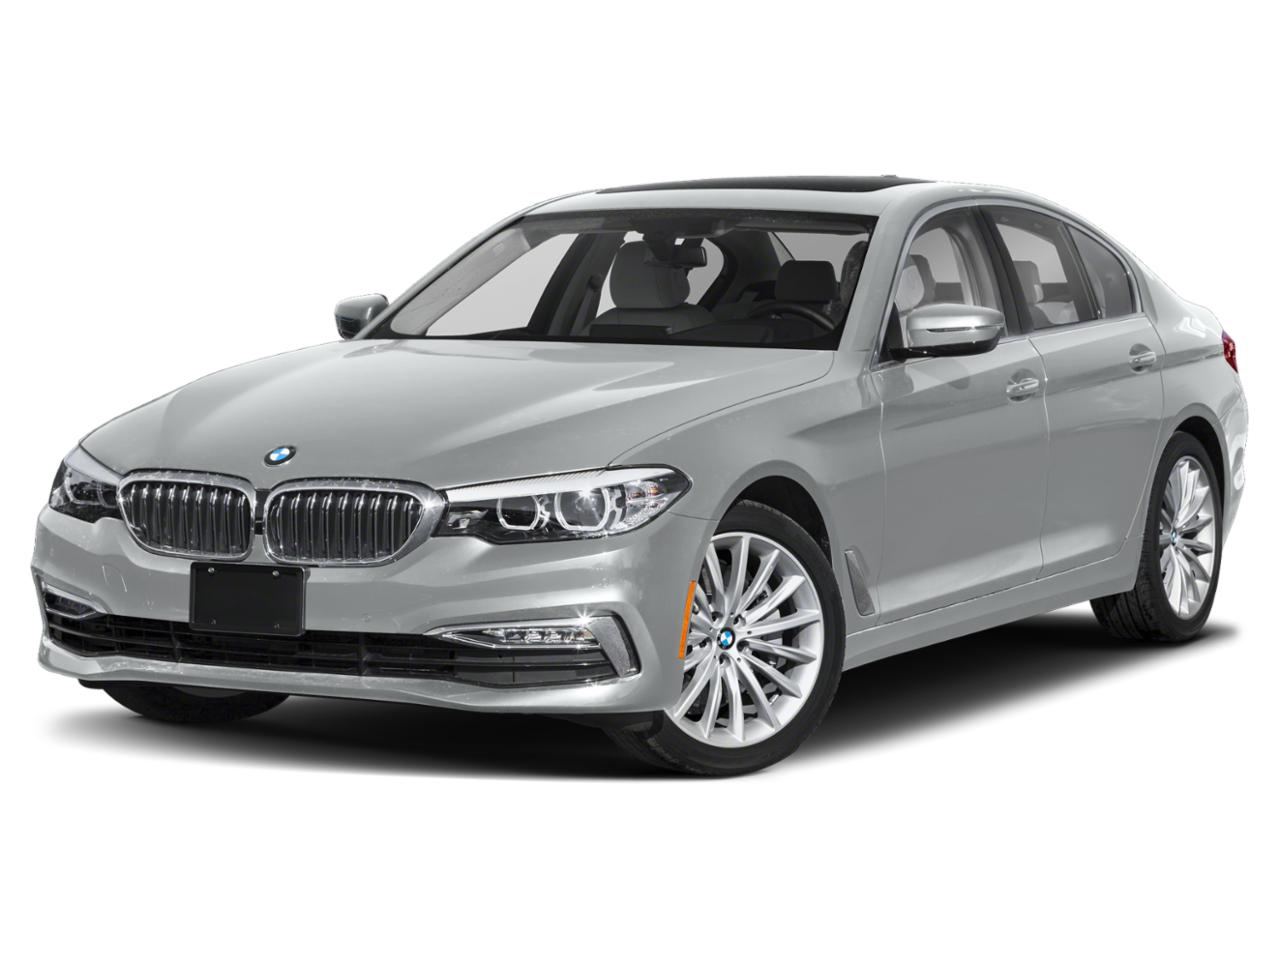 2018 BMW 530i Vehicle Photo in Pleasanton, CA 94588